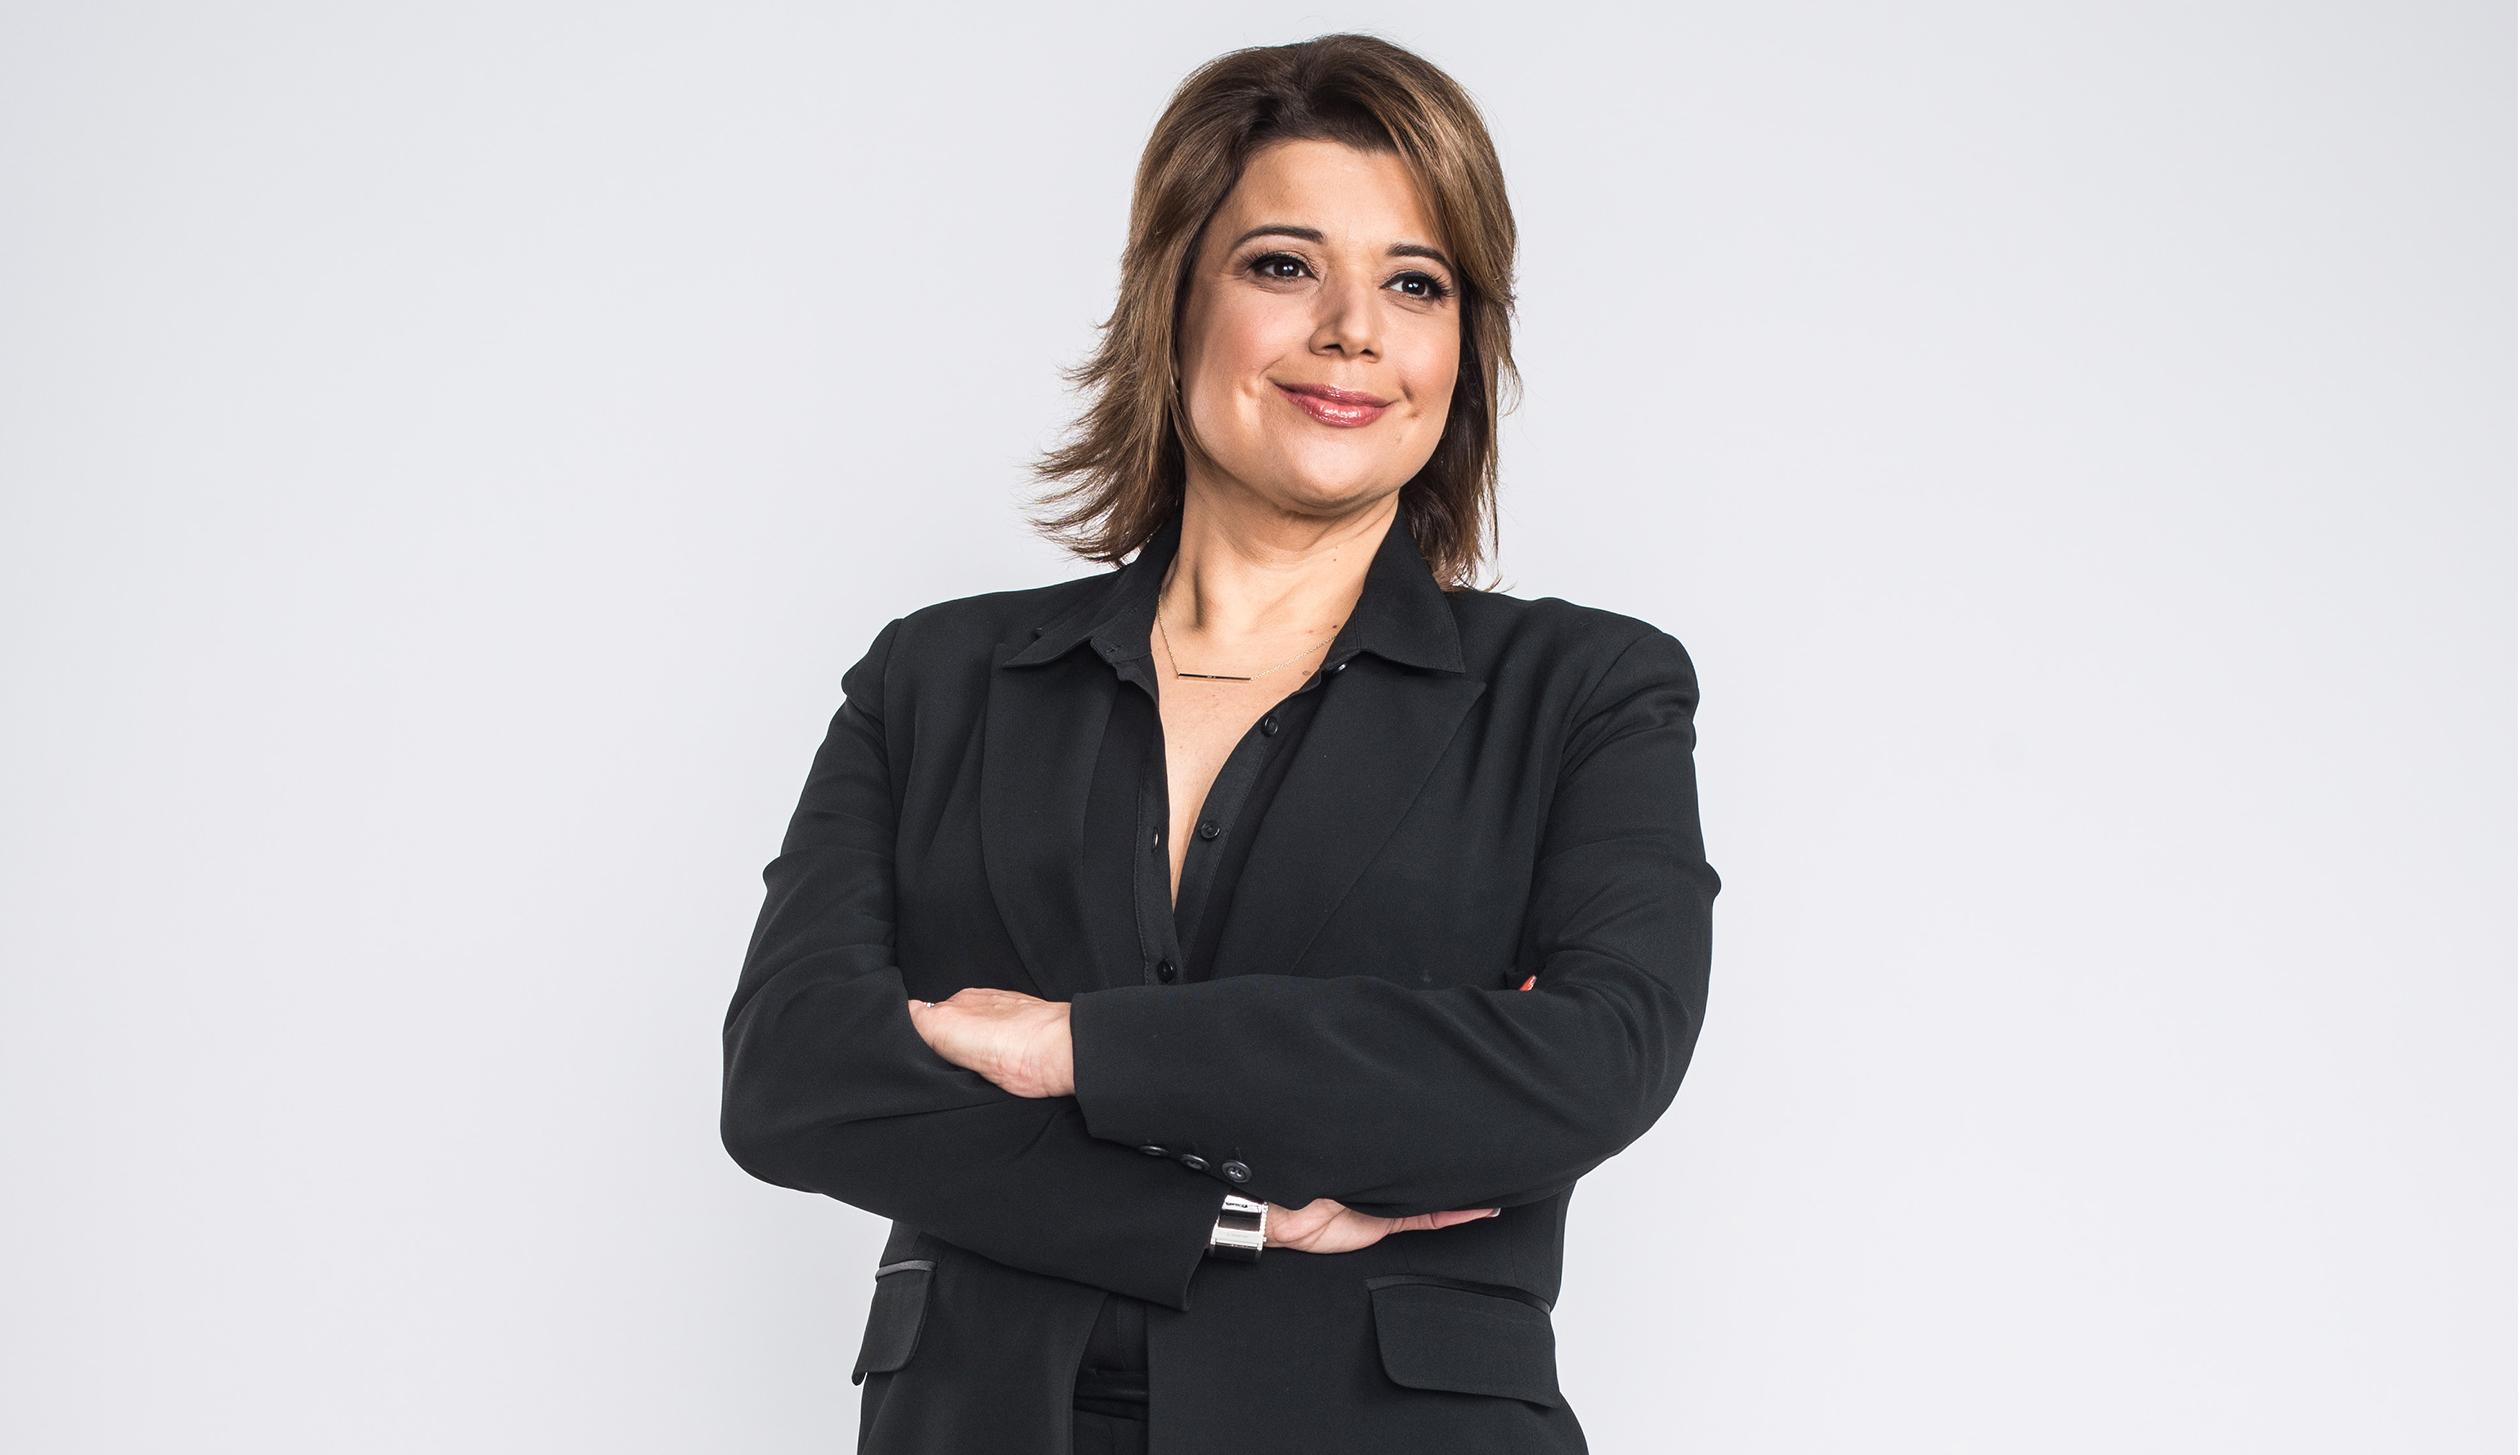 Republican strategist and political commentator Ana Navarro